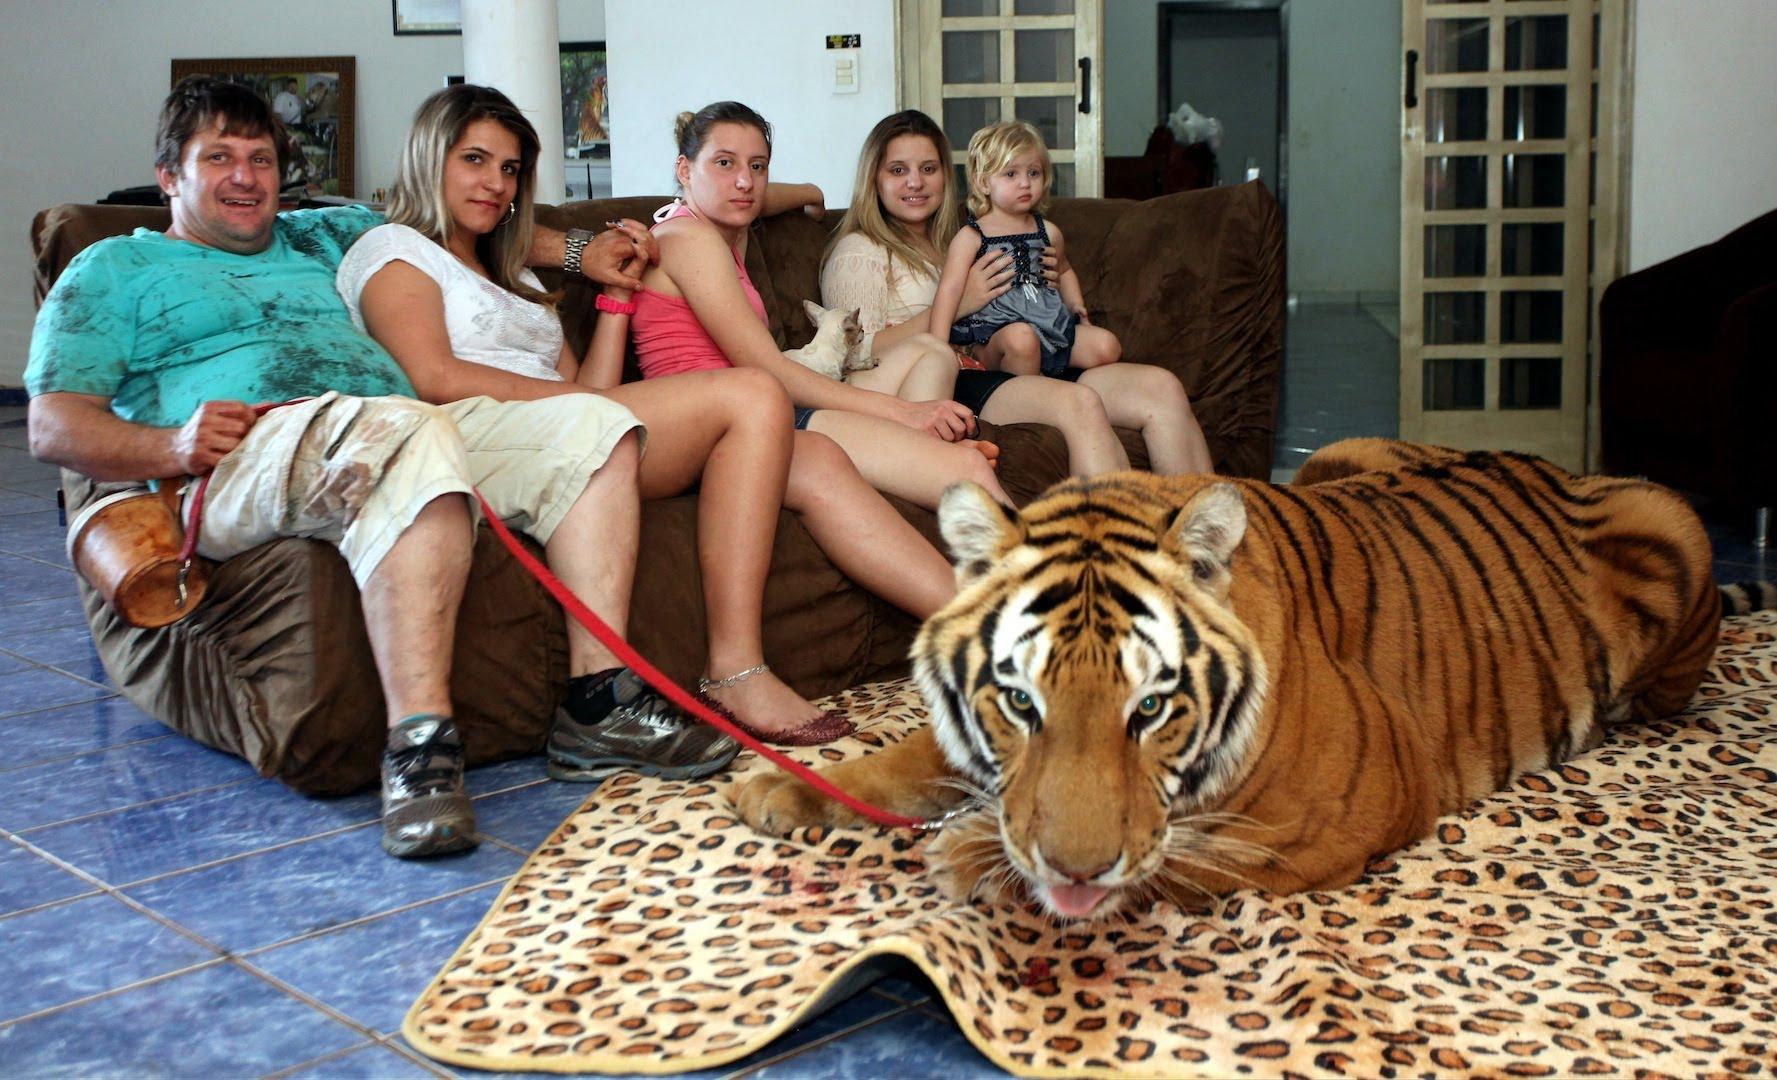 VIDEO: Rodina žije doma s tygry!